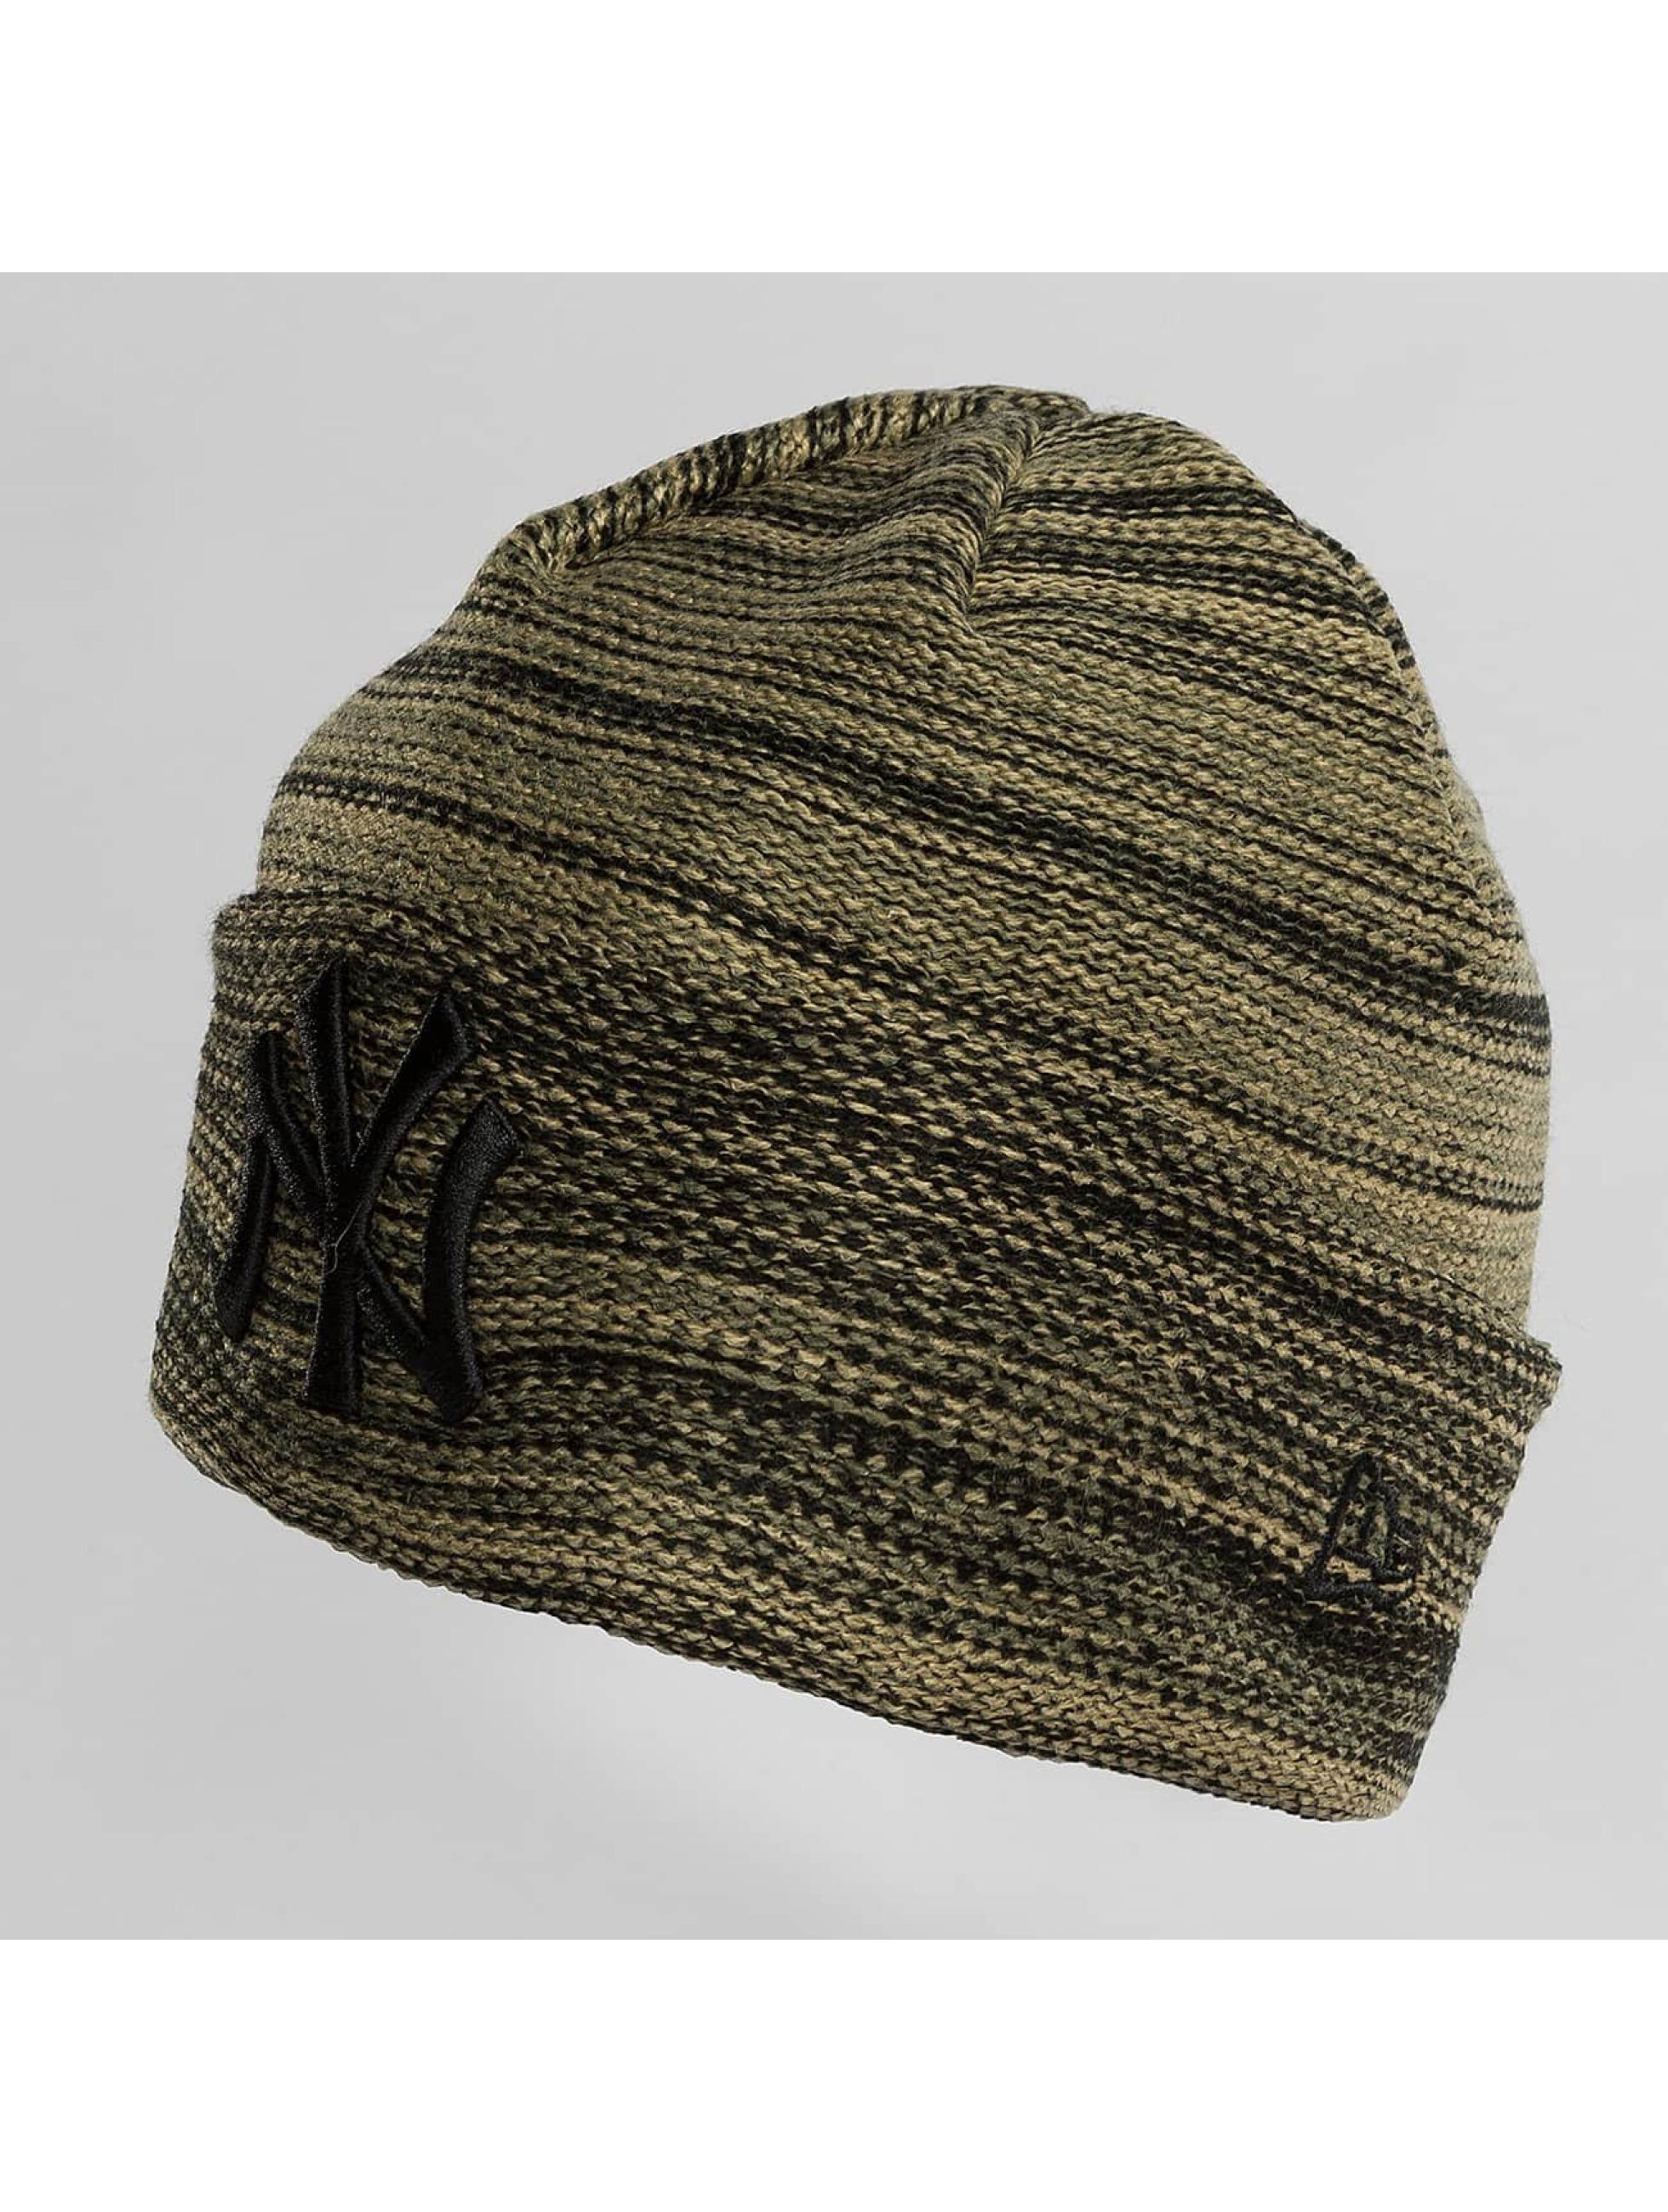 New Era Hat-1 Marl Cuff NY Yankees green